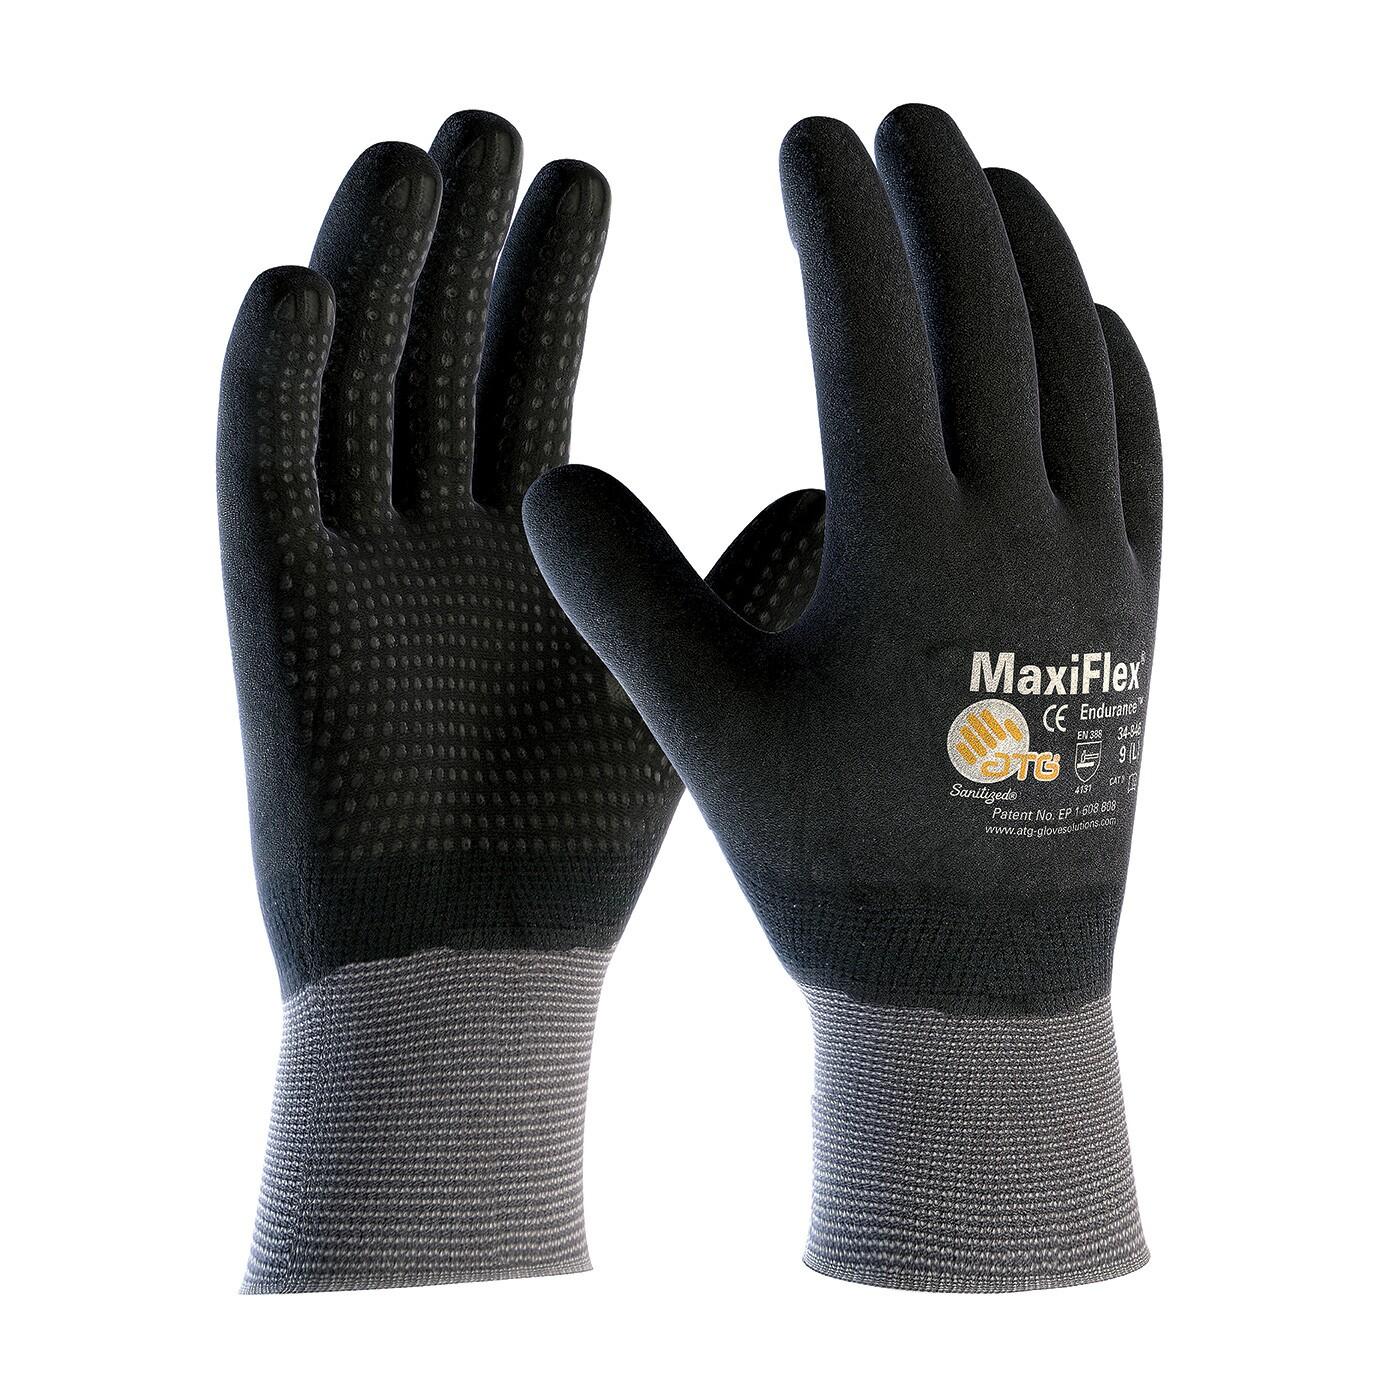 Atg Maxiflex Endurance Full Hand Coated Gloves Coated